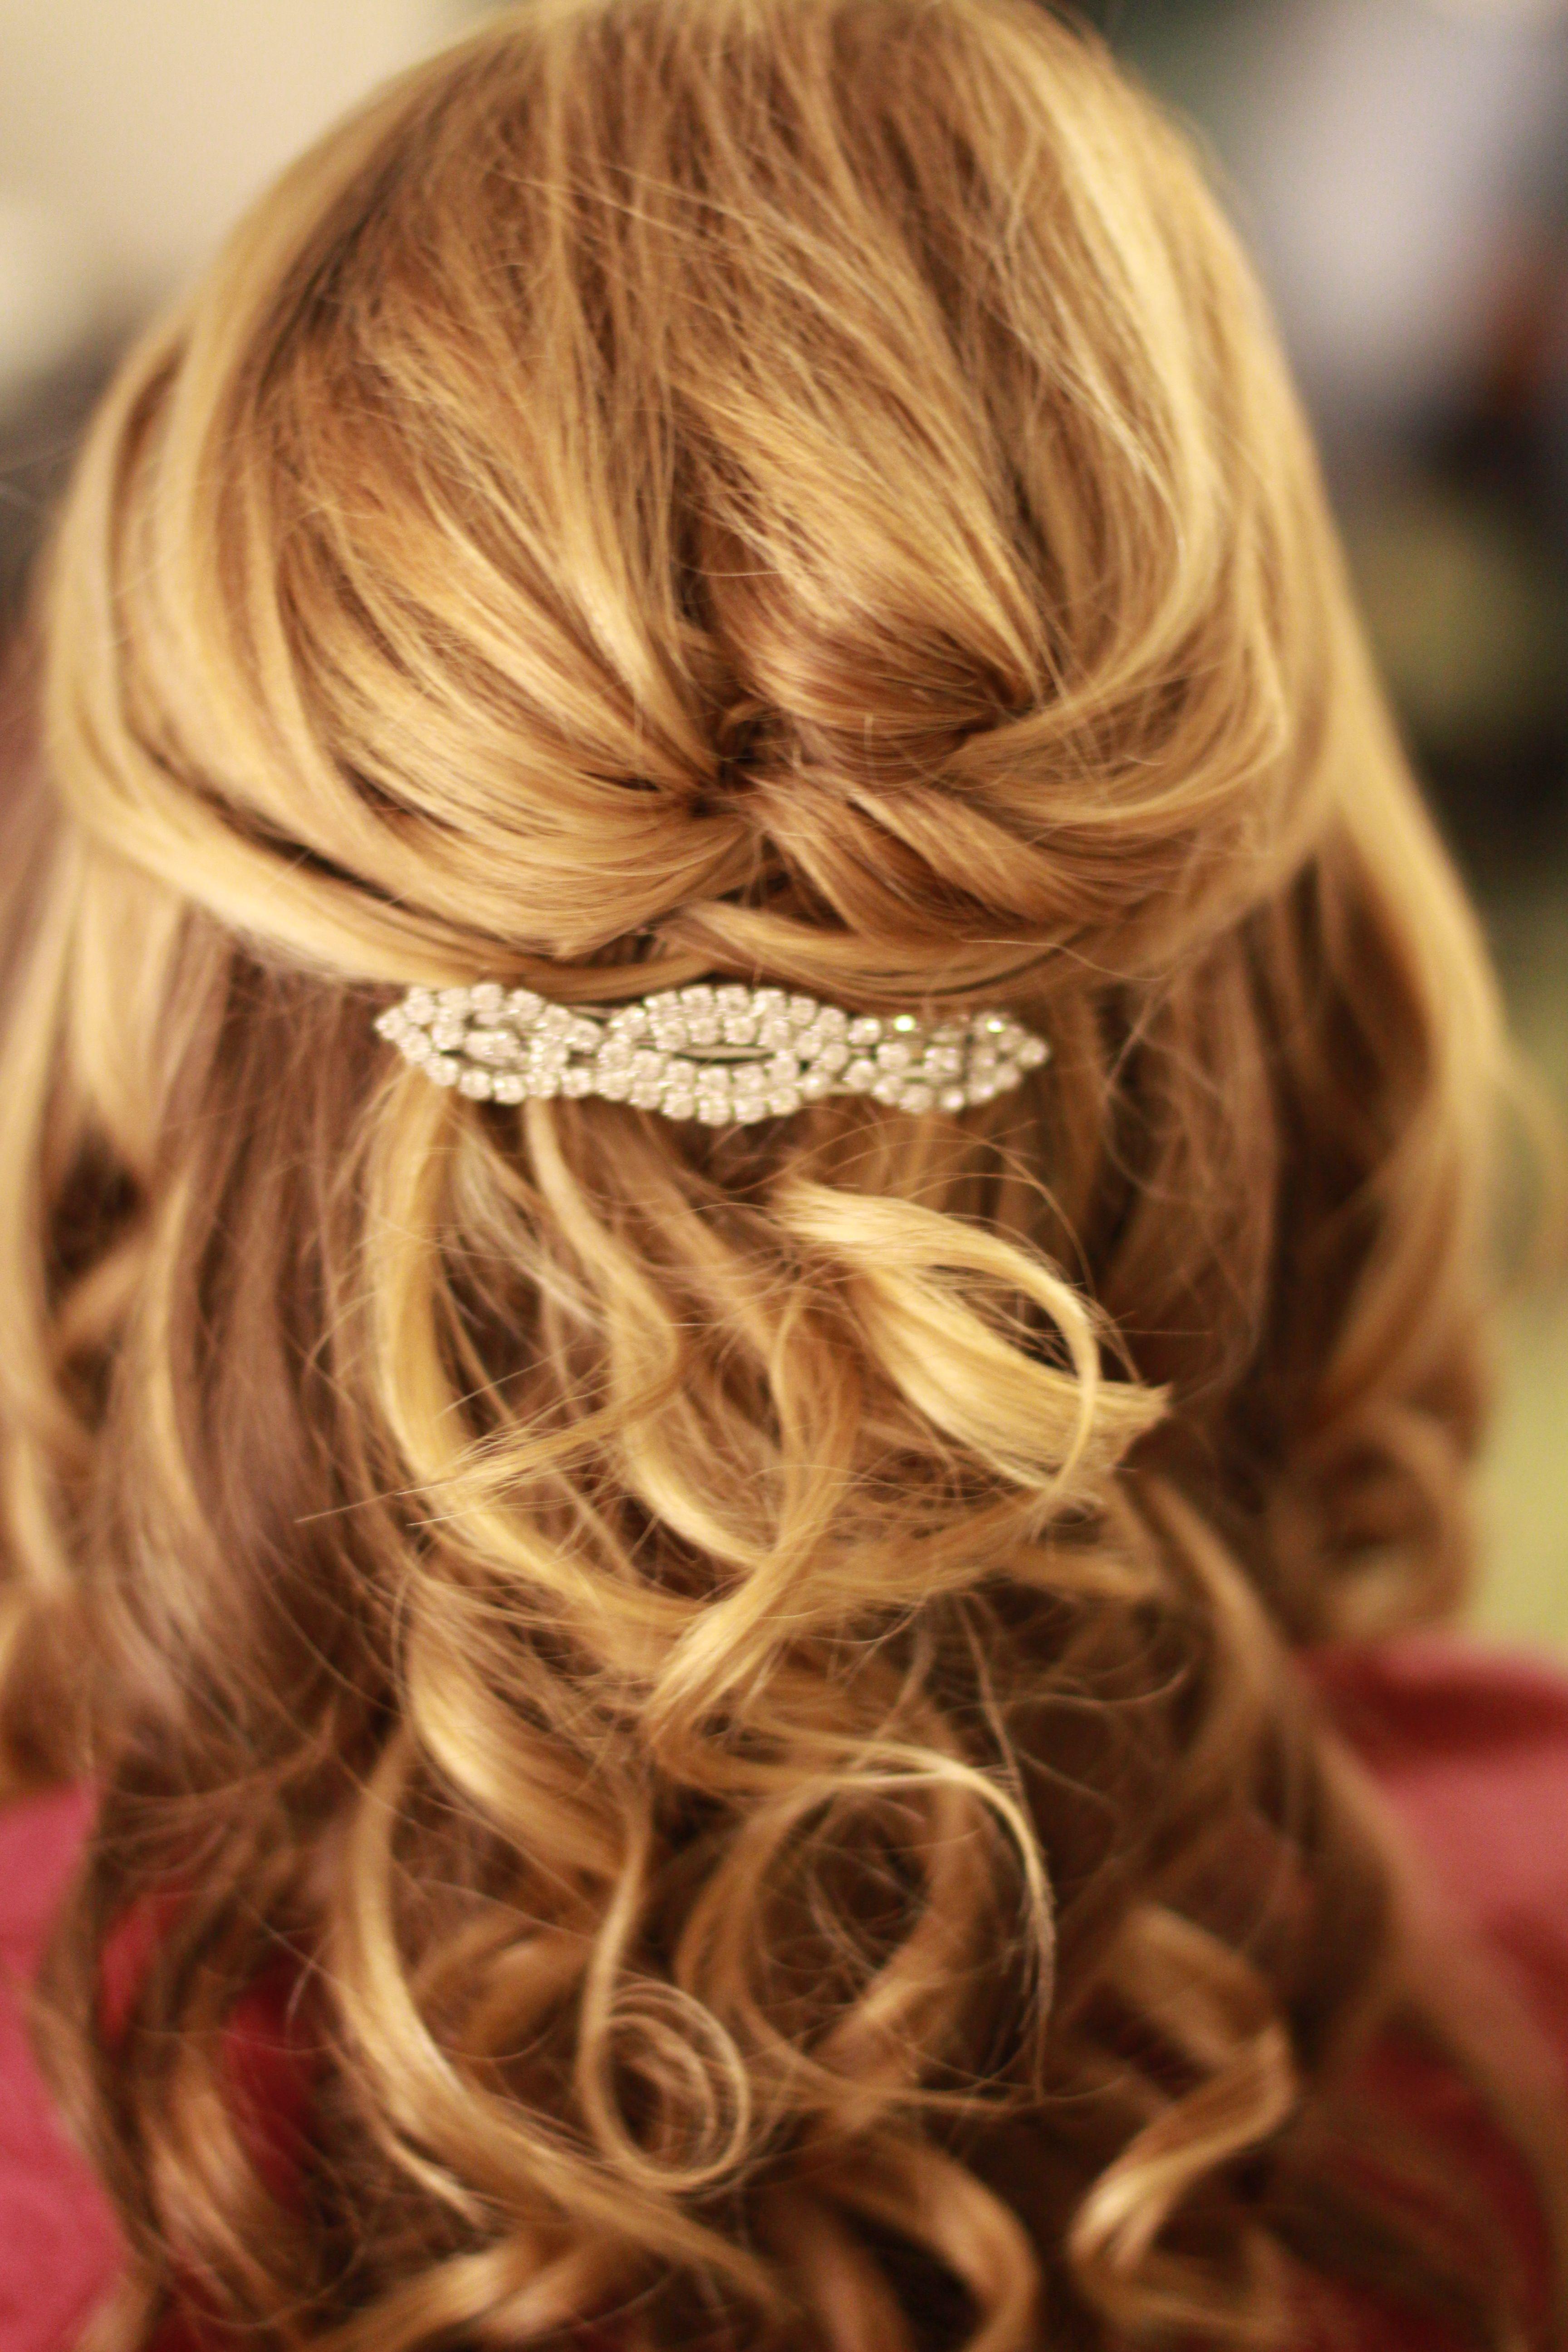 Half Updo Shoulder Length Hair Wedding Hairstyles For Medium Hair Mother Of The Bride Hair Wedding Hair Down